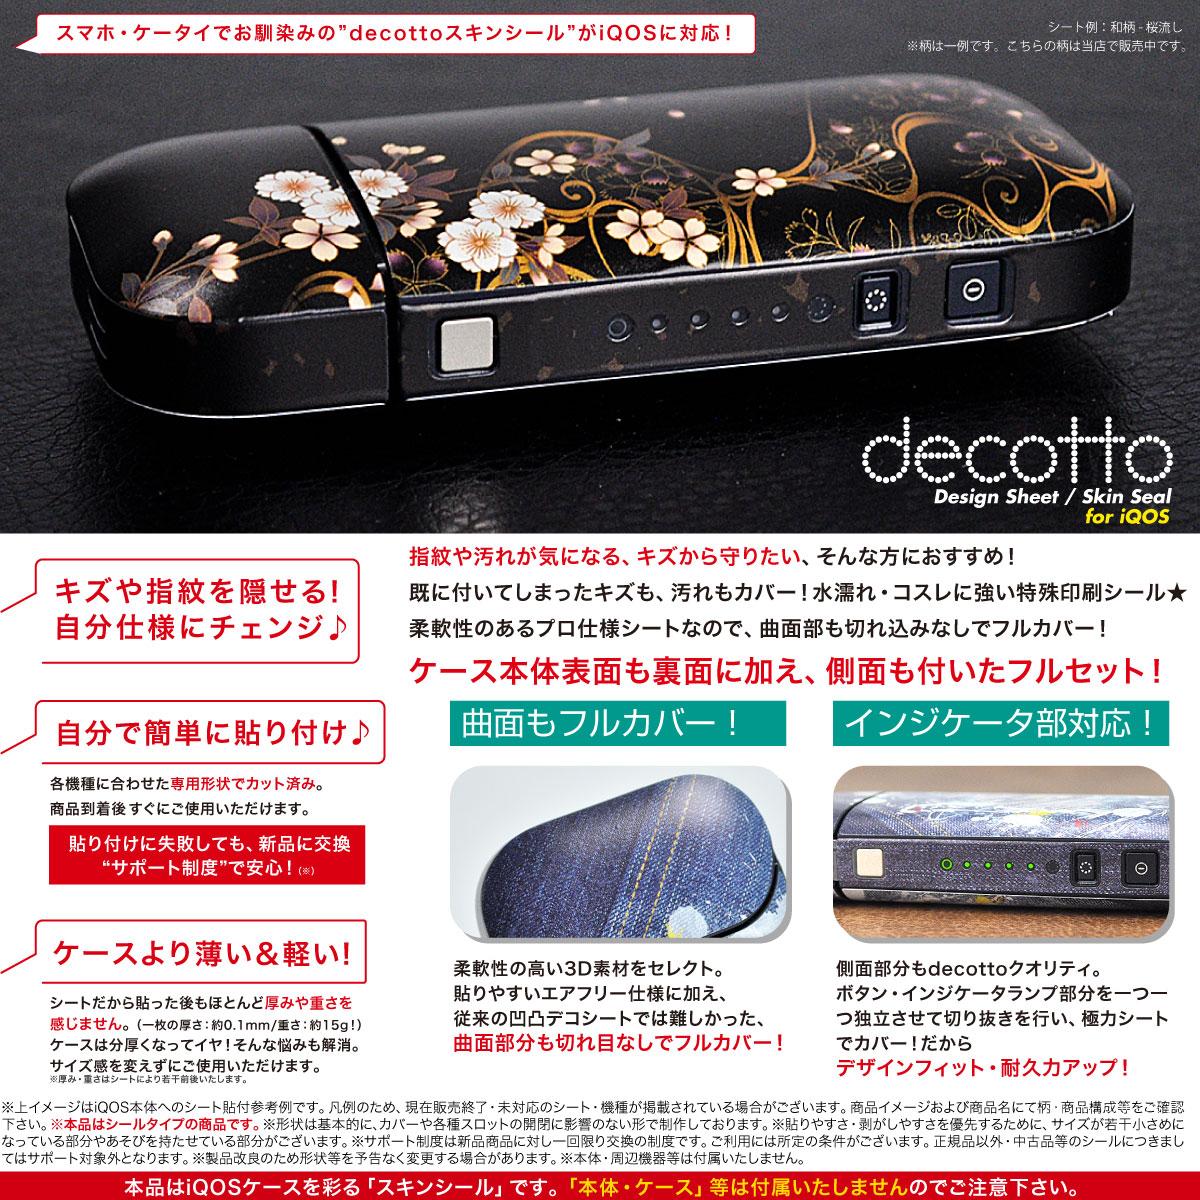 iQOS(アイコス) 専用 デコレーション スキンシール 表面・裏面&側面セット 【 和柄 華桜 シリーズ 】